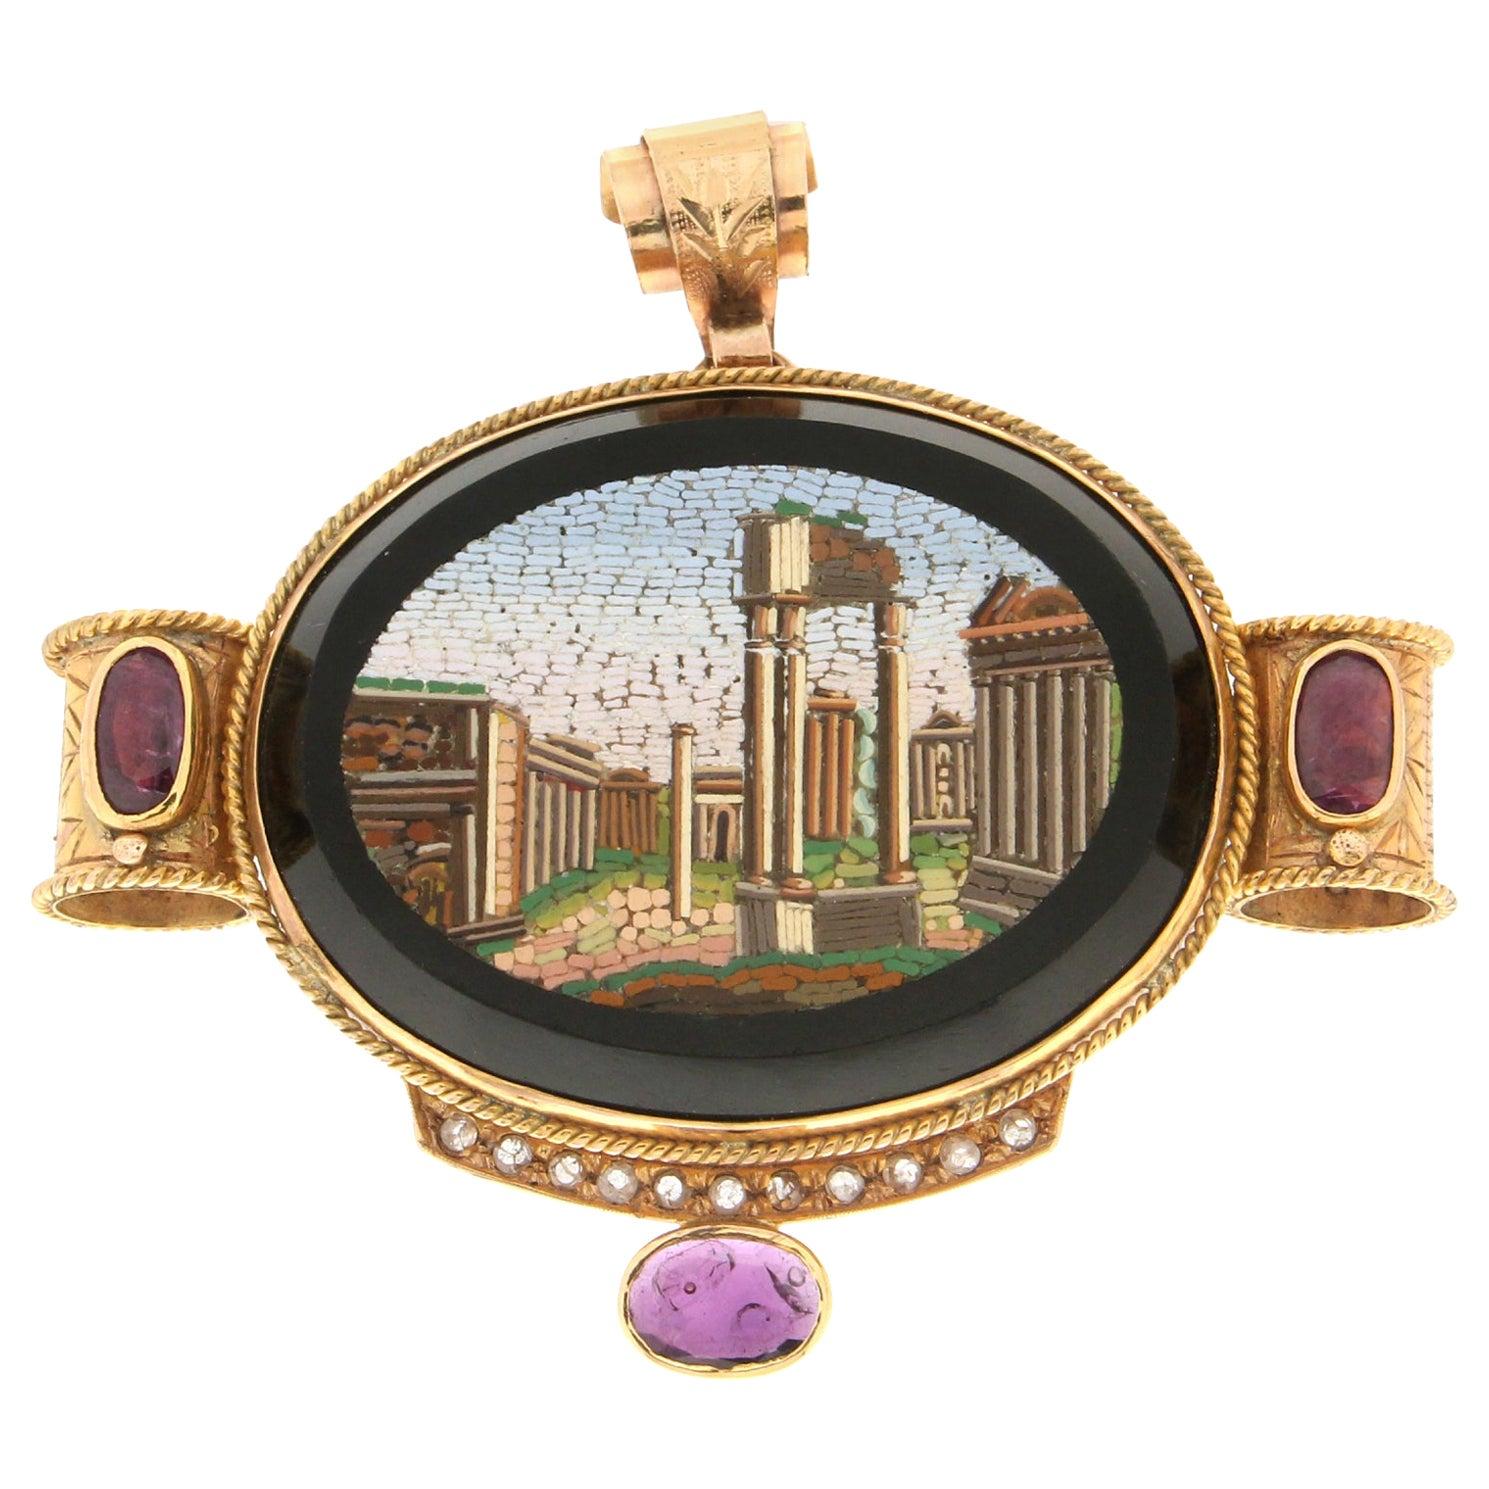 Handcraft Mosaic 14 Karat Yellow Gold Ruby Rose Cut Diamonds Pendant Necklace